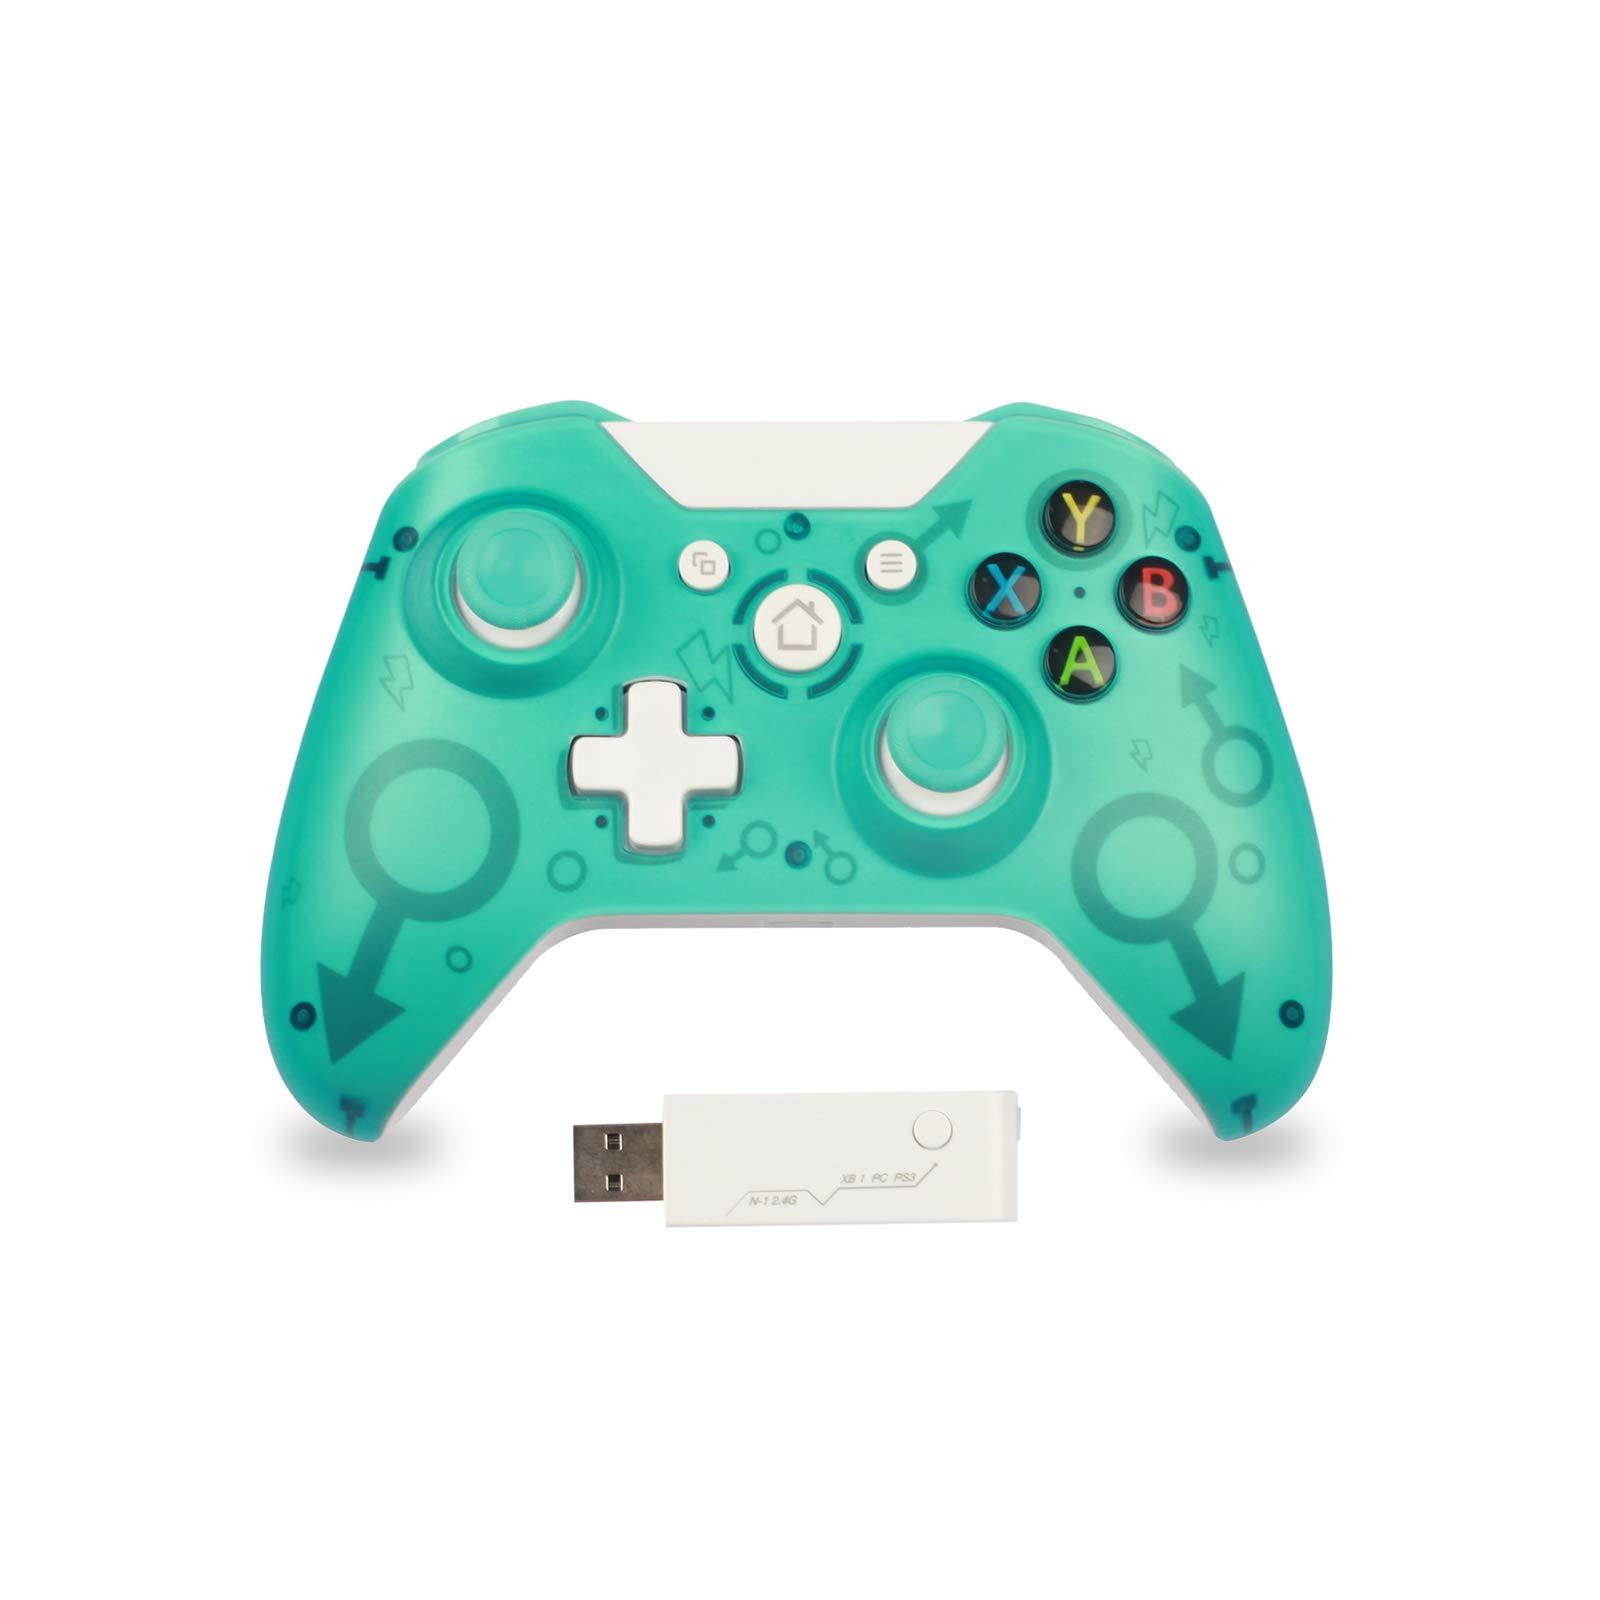 Mando para PC Mando para Xbox One Mando Inalámbrico Compatible con Xbox One /PS3/PC 2.4G Wireless Gamepad Joystick Inalámbrico(Verde): Amazon.es: Videojuegos